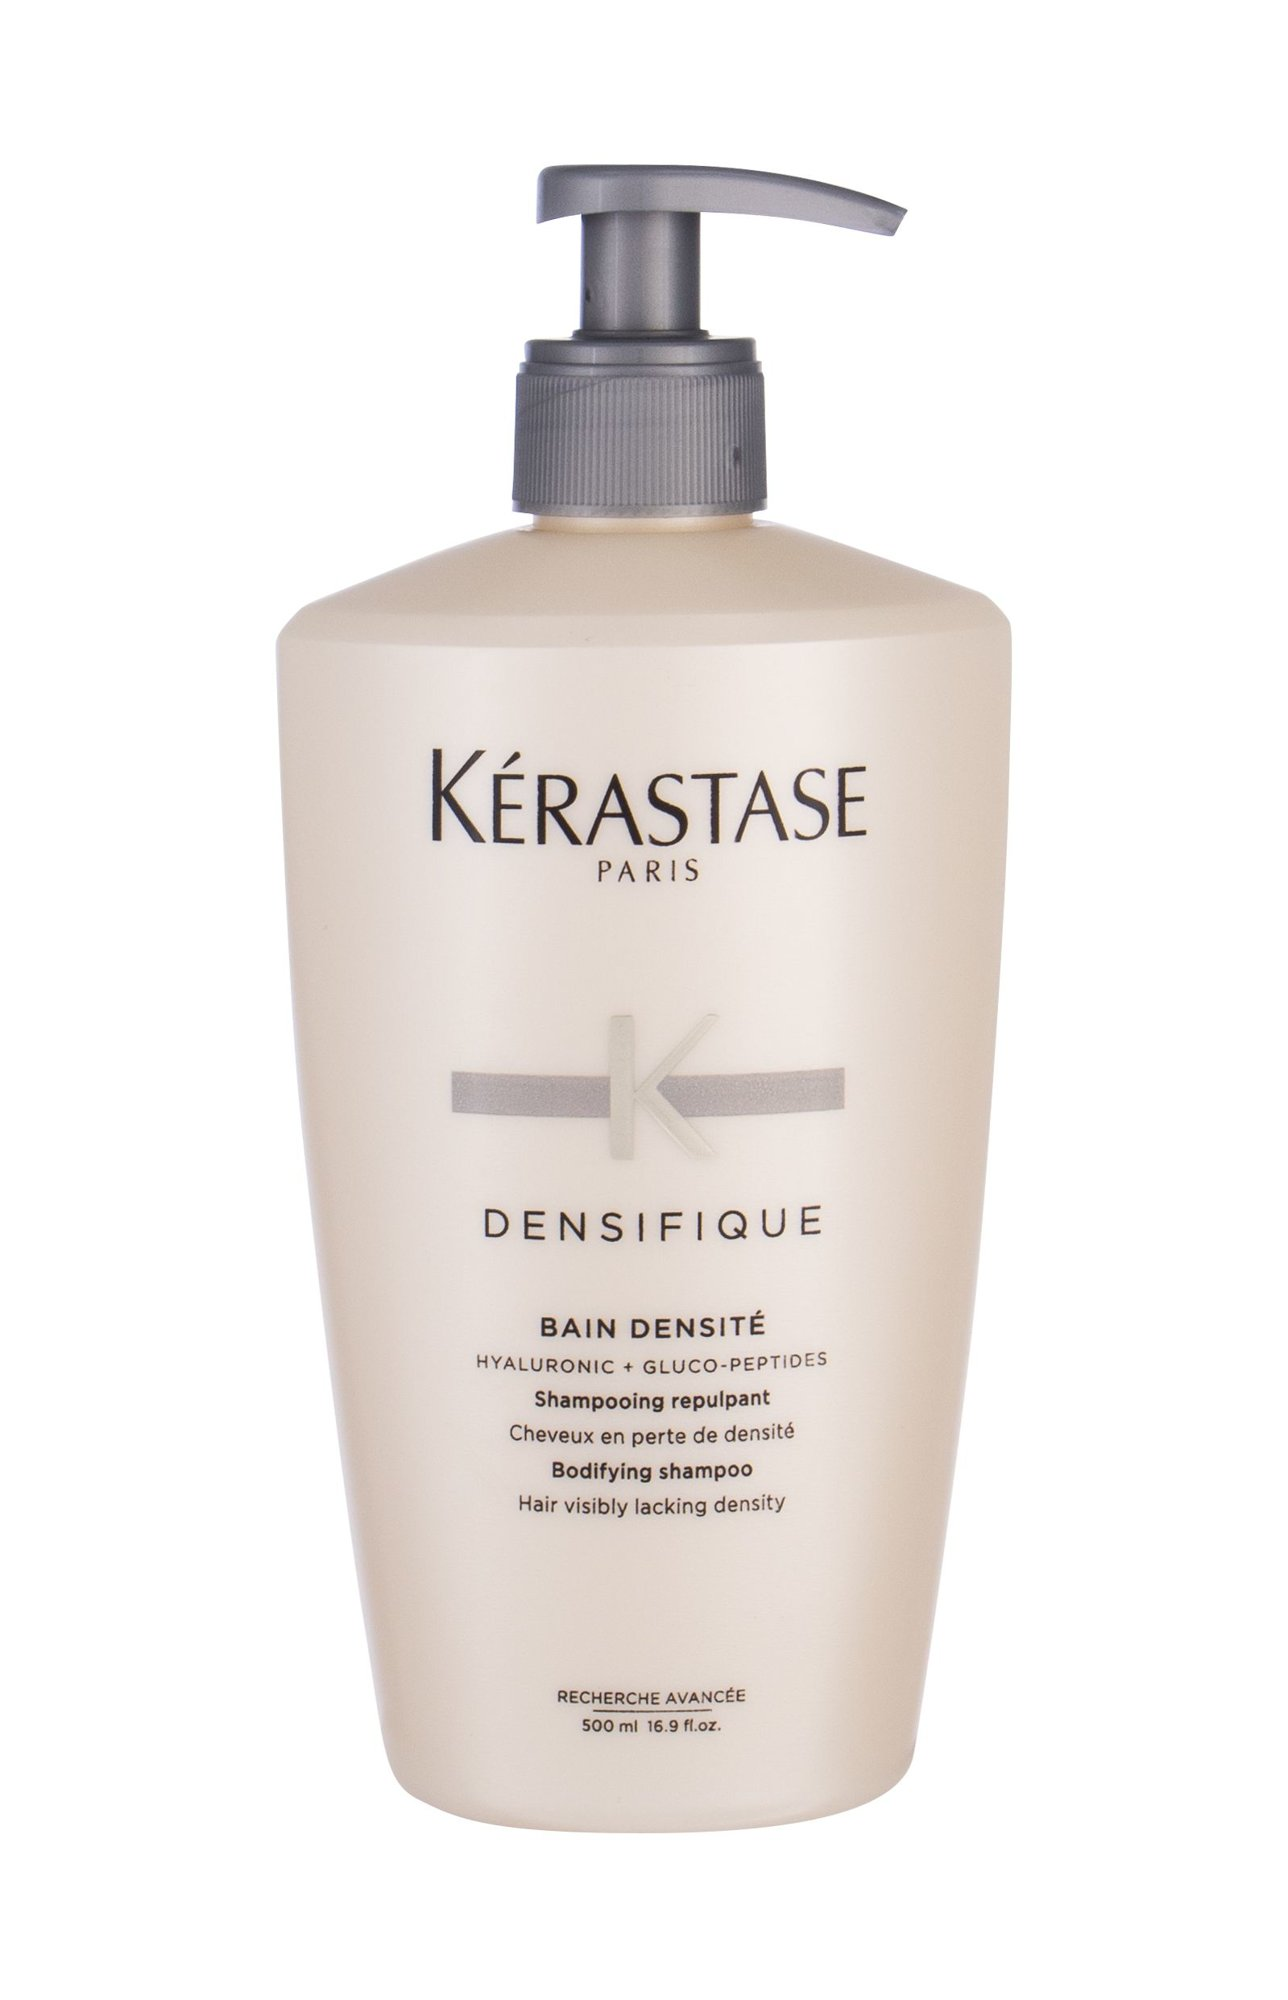 Kérastase Densifique Shampoo 500ml